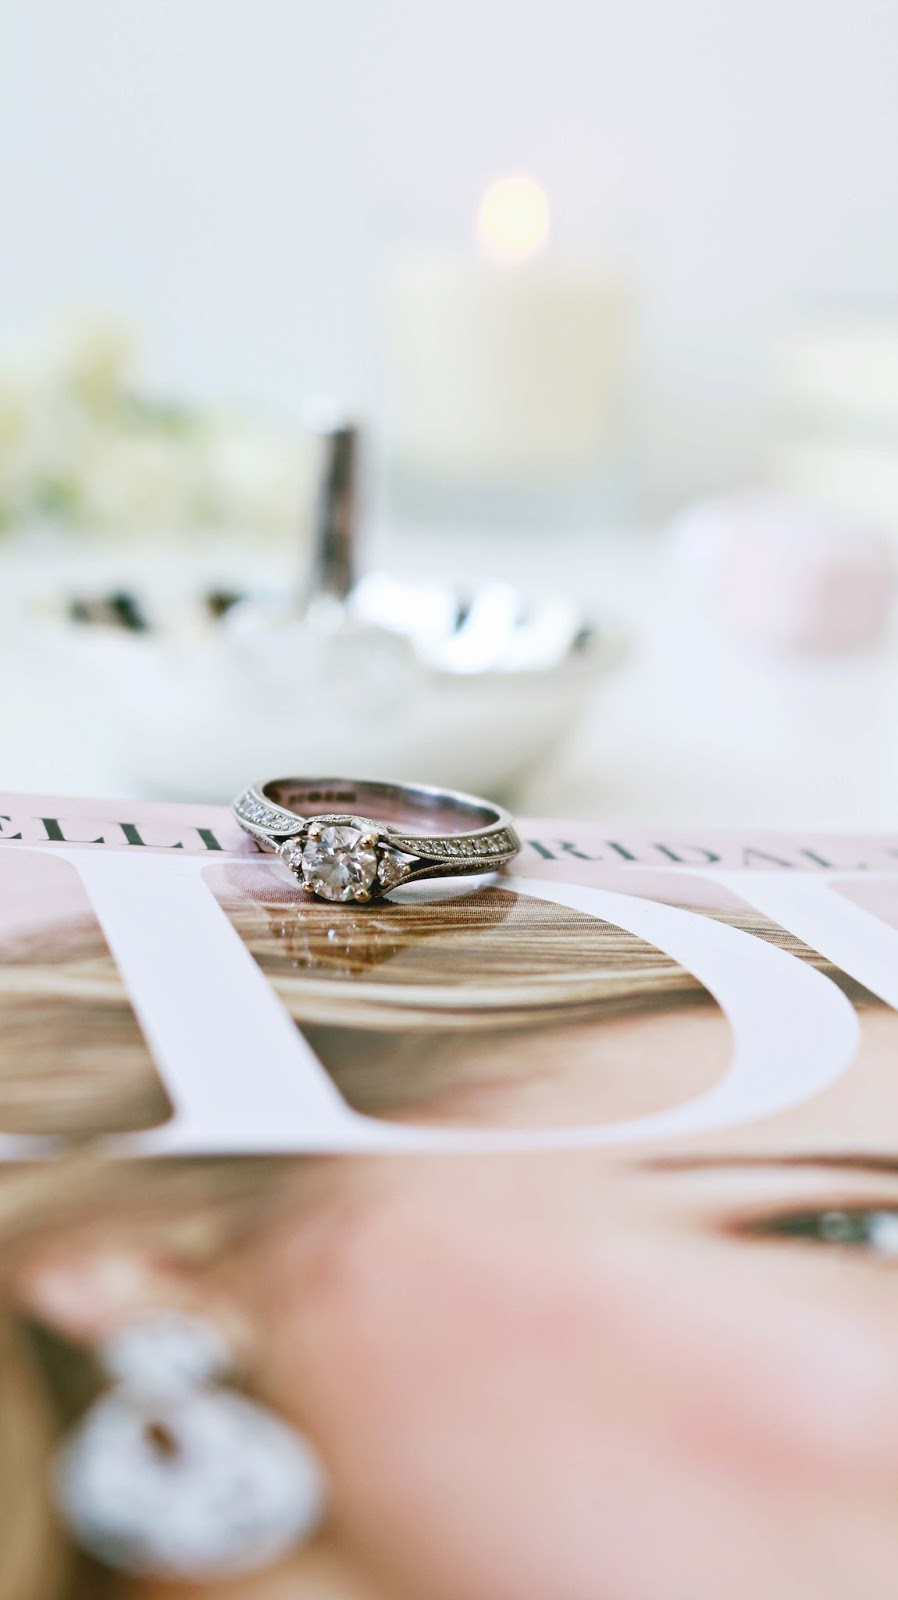 Bridal Gift guide, wedding, wedding presents, engagement presents, vera wang at wedgwood, wedgwood, vera wang, bridal, bride to be presents, wedding planning, lifestyle, etsy, wedding planning presents, bridal shower